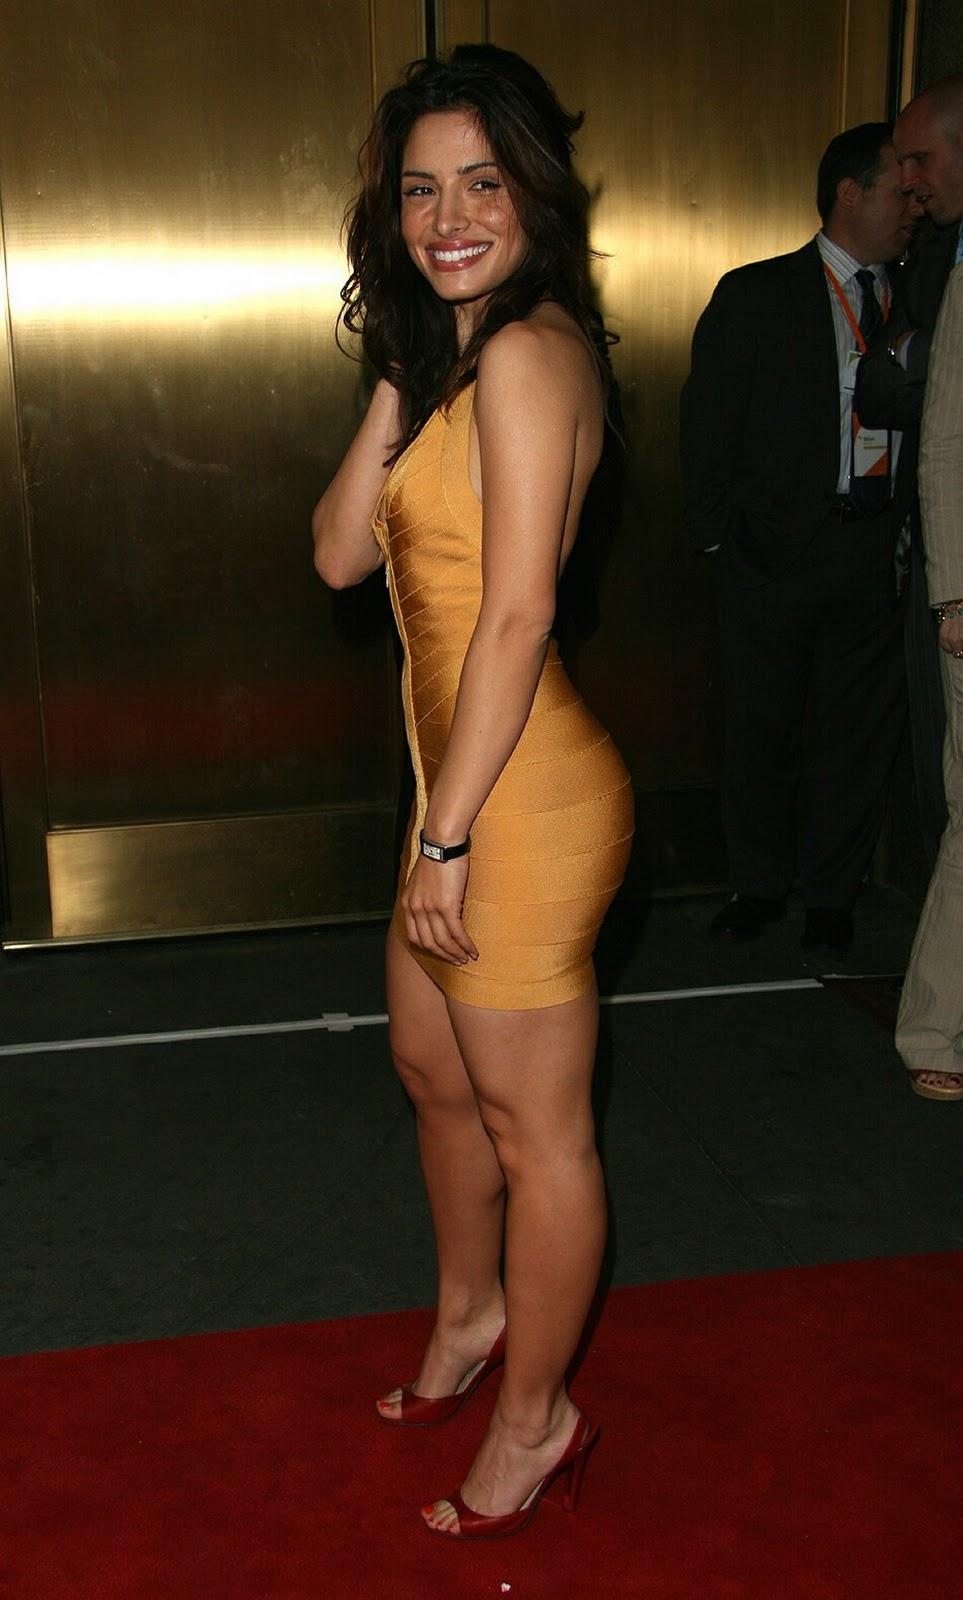 Sarah Shahi Hot Nude And Very Teasing Topless Twitter